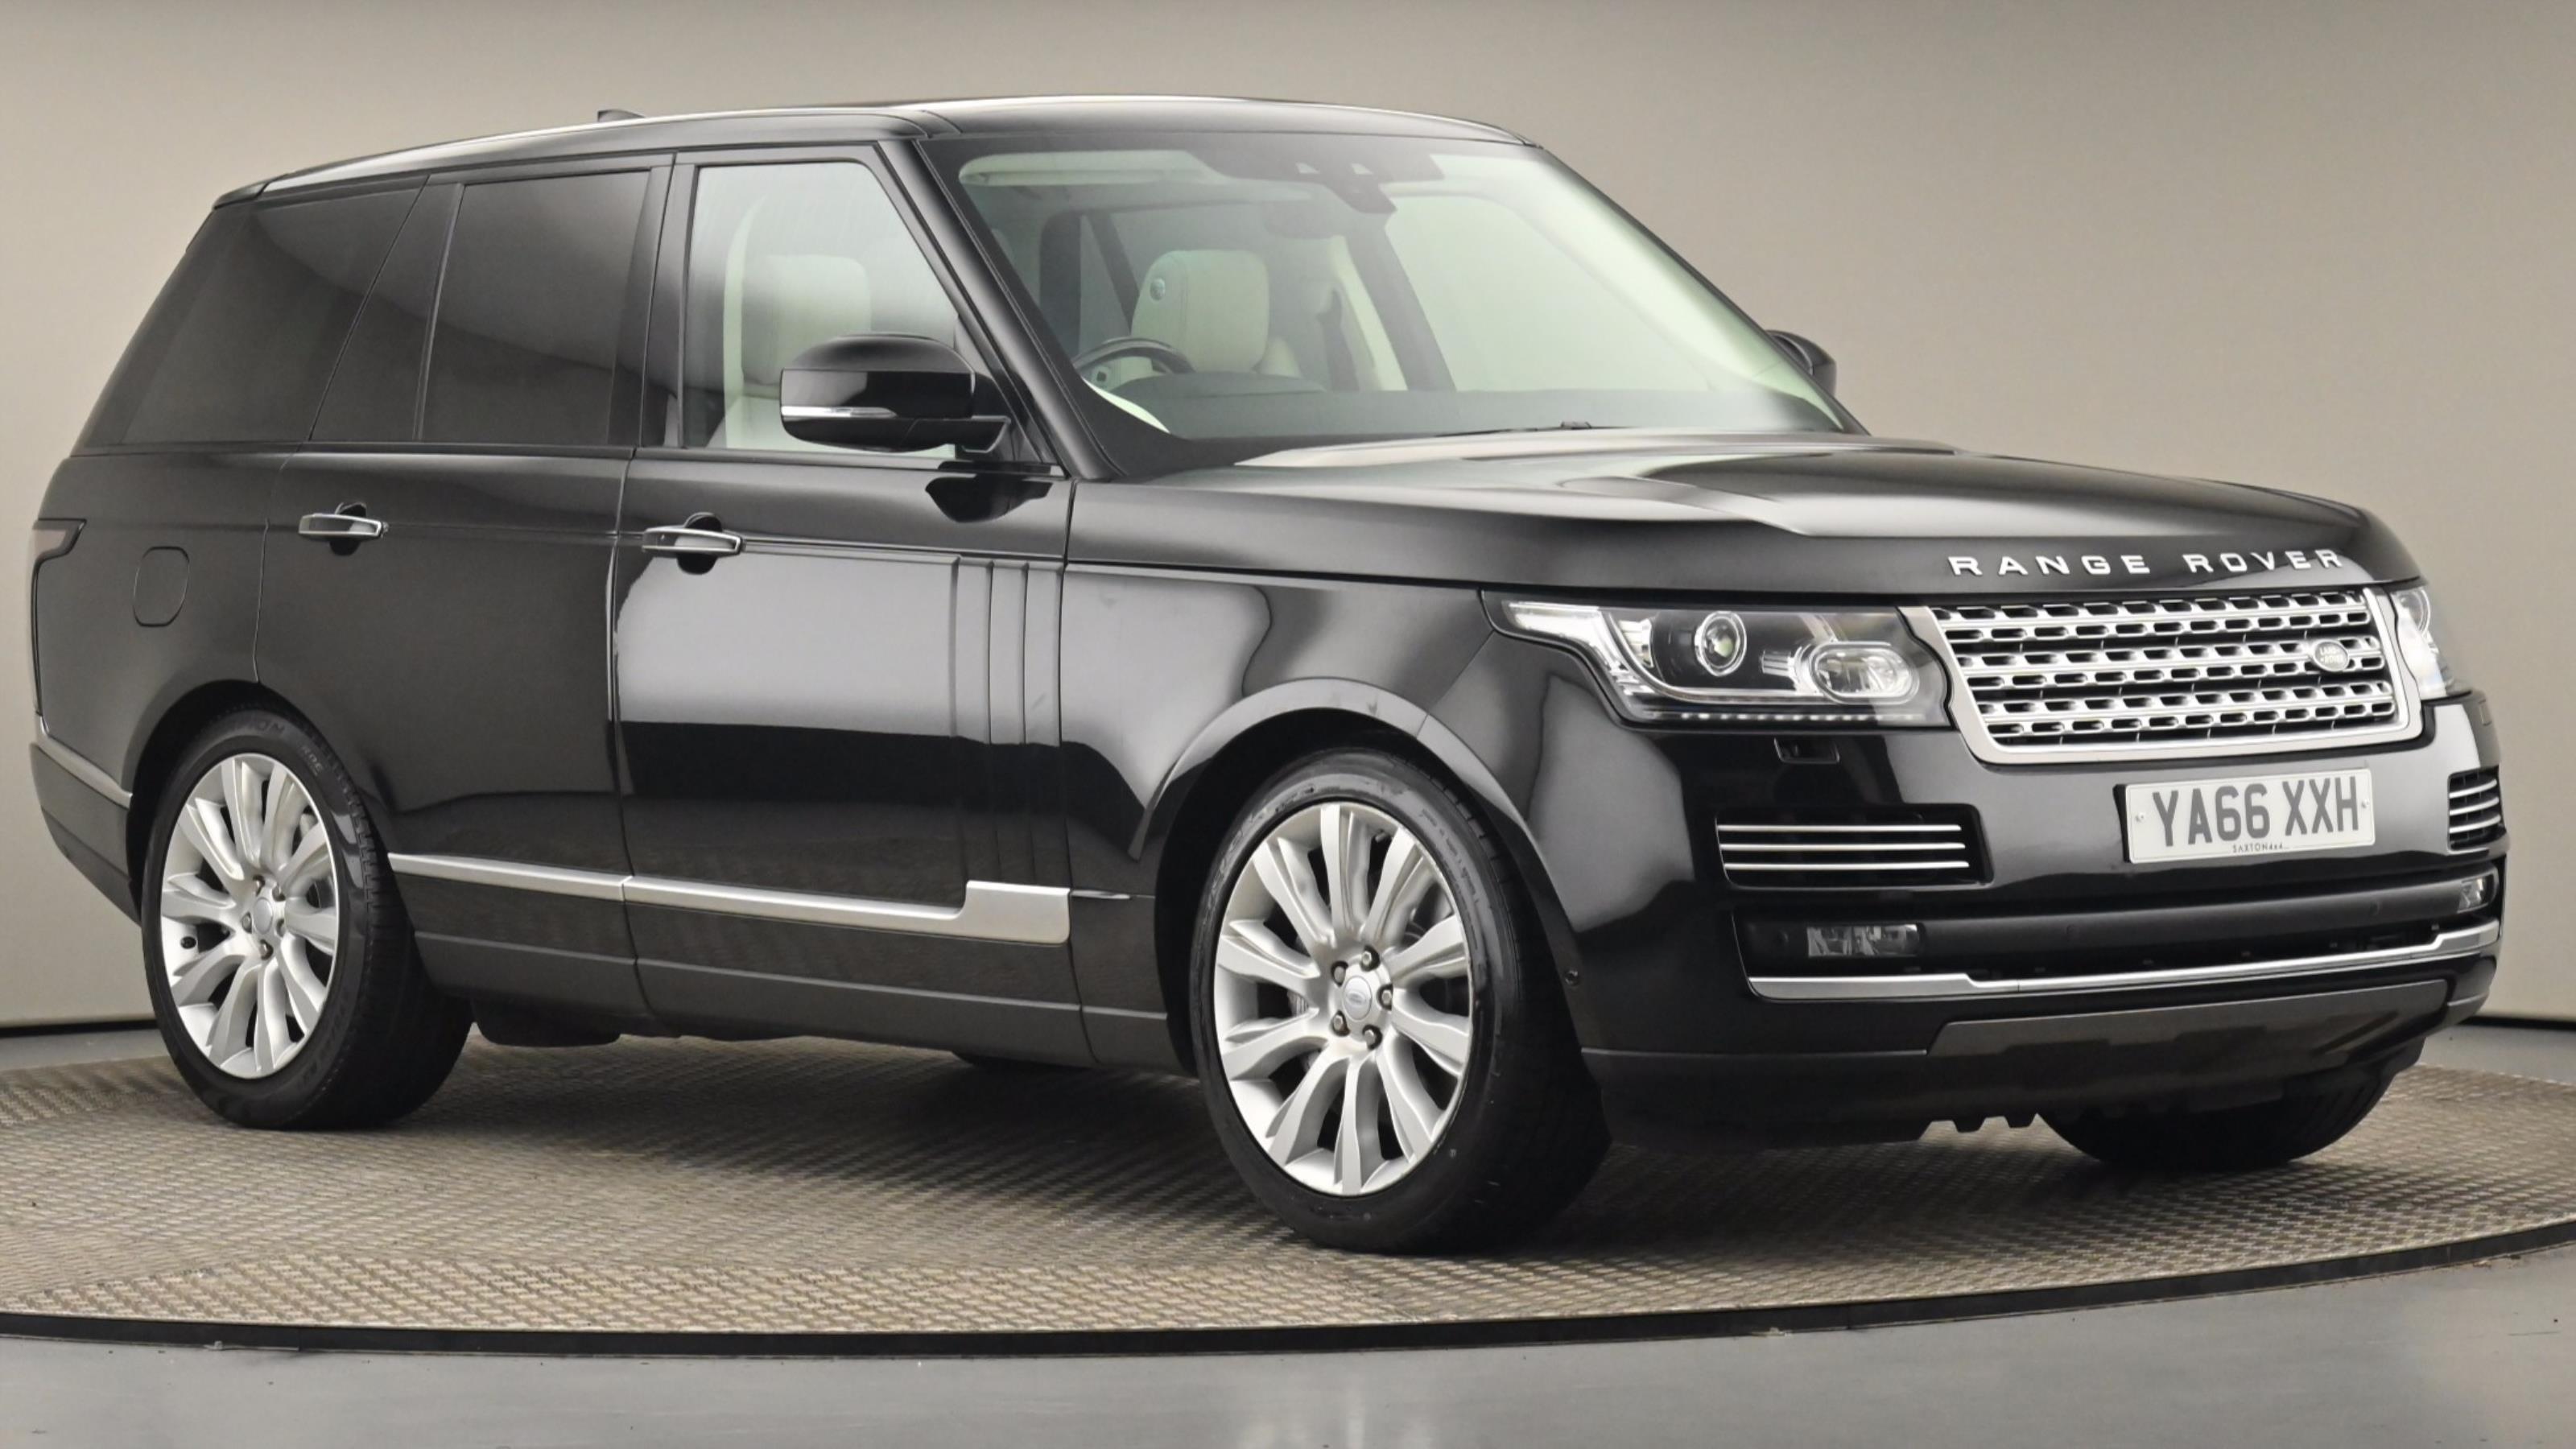 Used 2016 Land Rover RANGE ROVER 4.4 SDV8 Vogue SE 4dr Auto at Saxton4x4